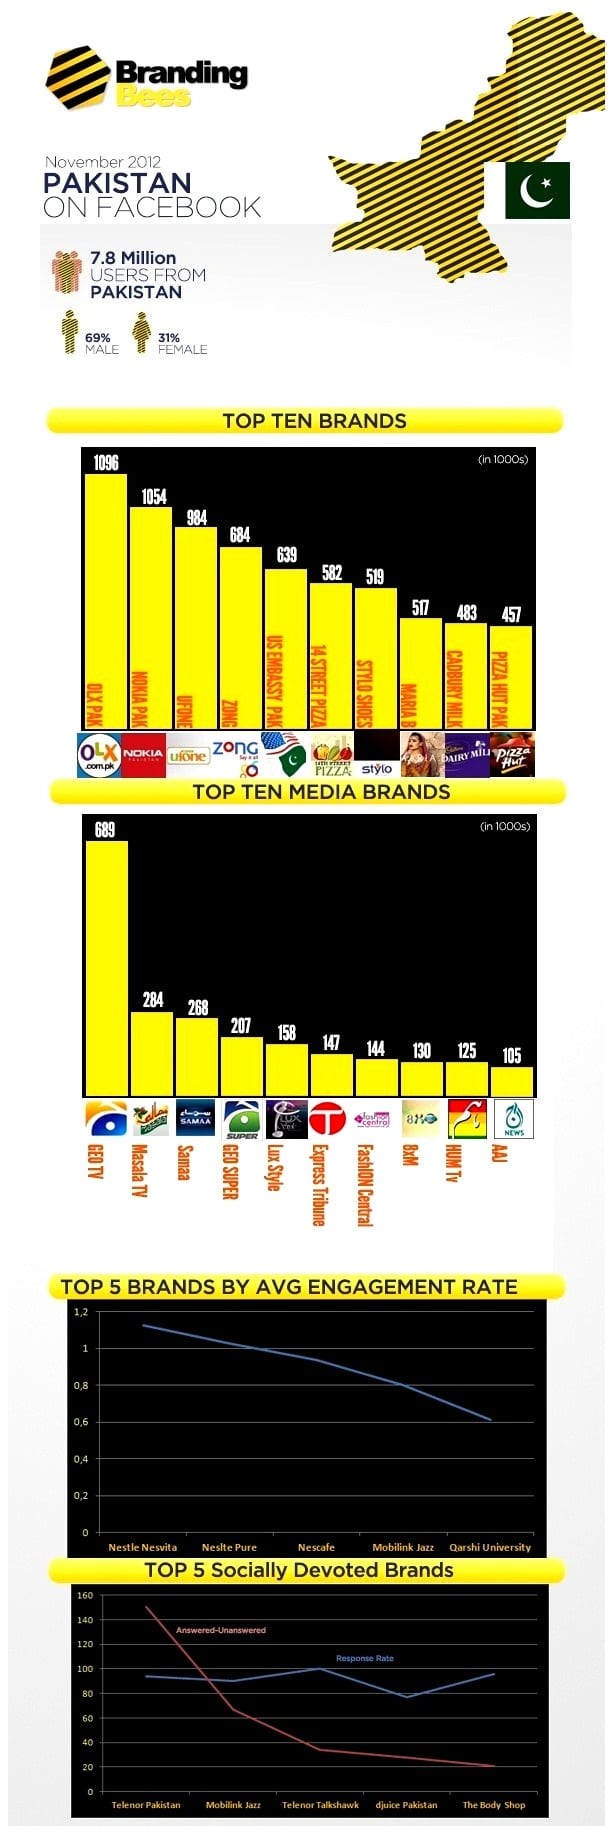 https://www.phoneworld.com.pk/wp-content/uploads/2012/12/stats.jpg